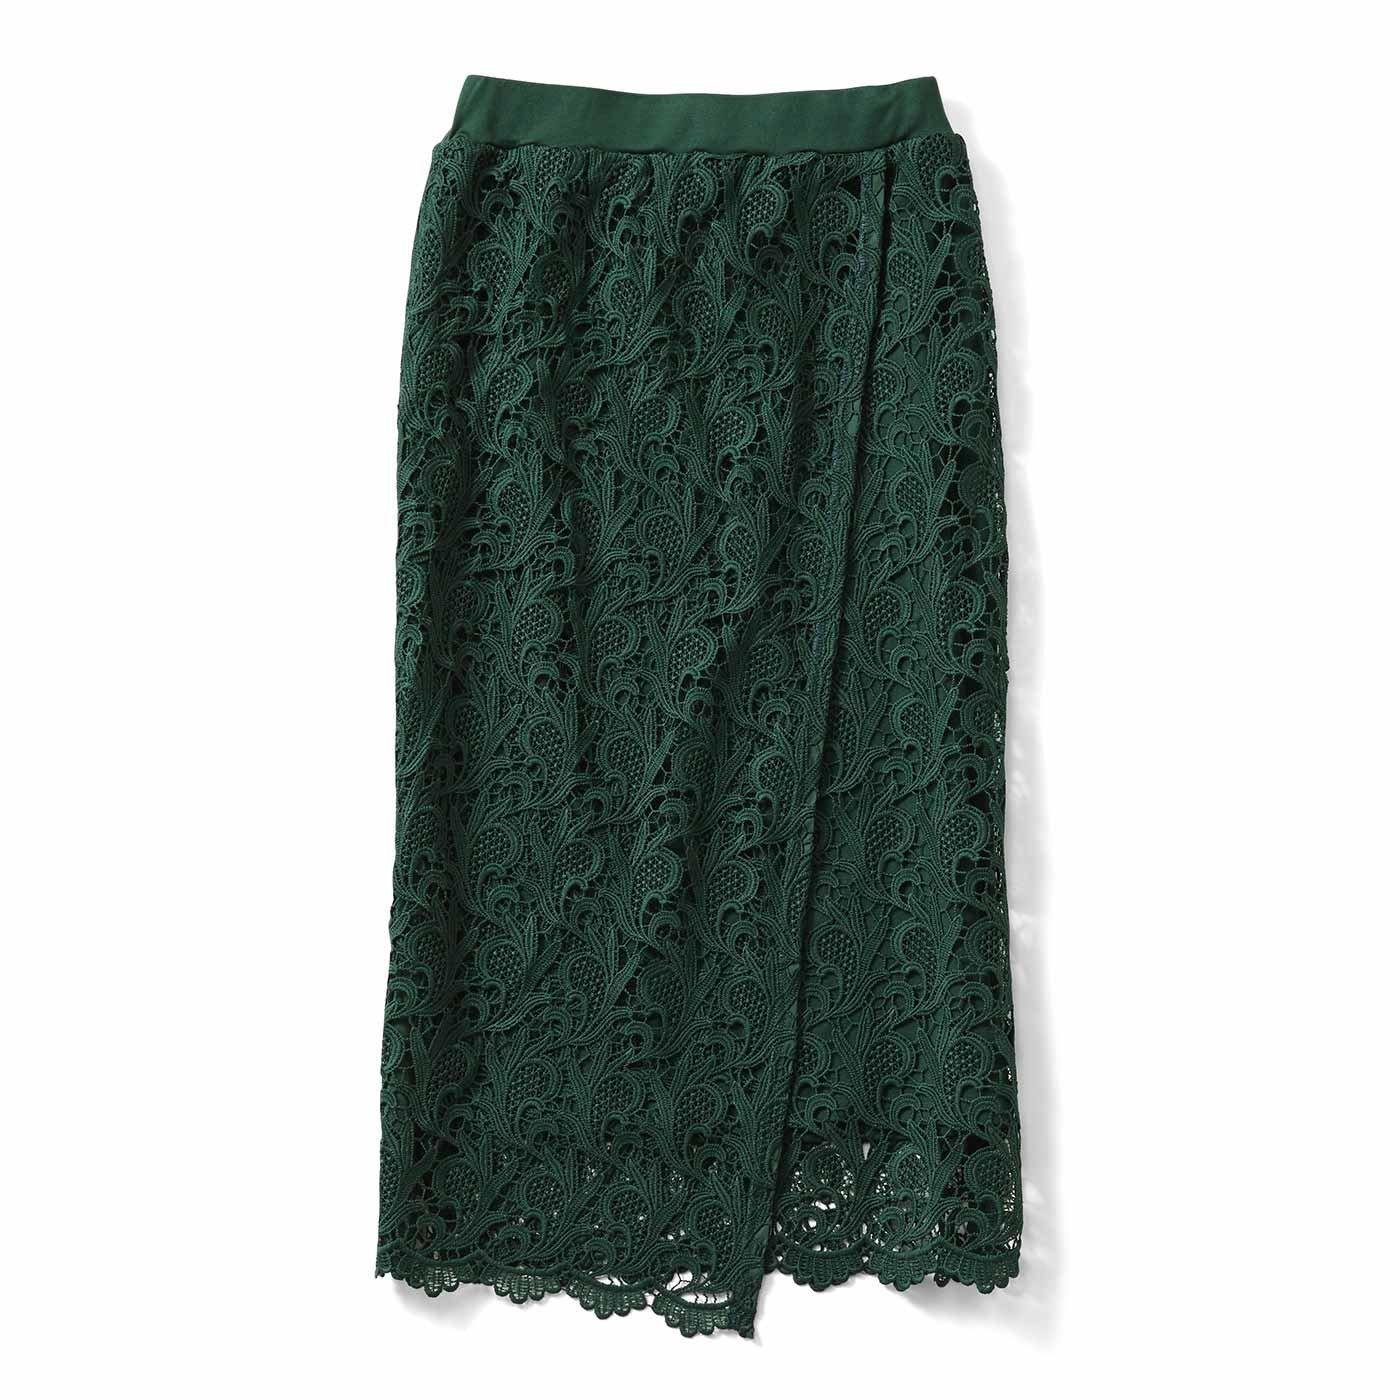 IEDIT[イディット] あったか裏地付き ラップデザインレーススカート〈グリーン〉